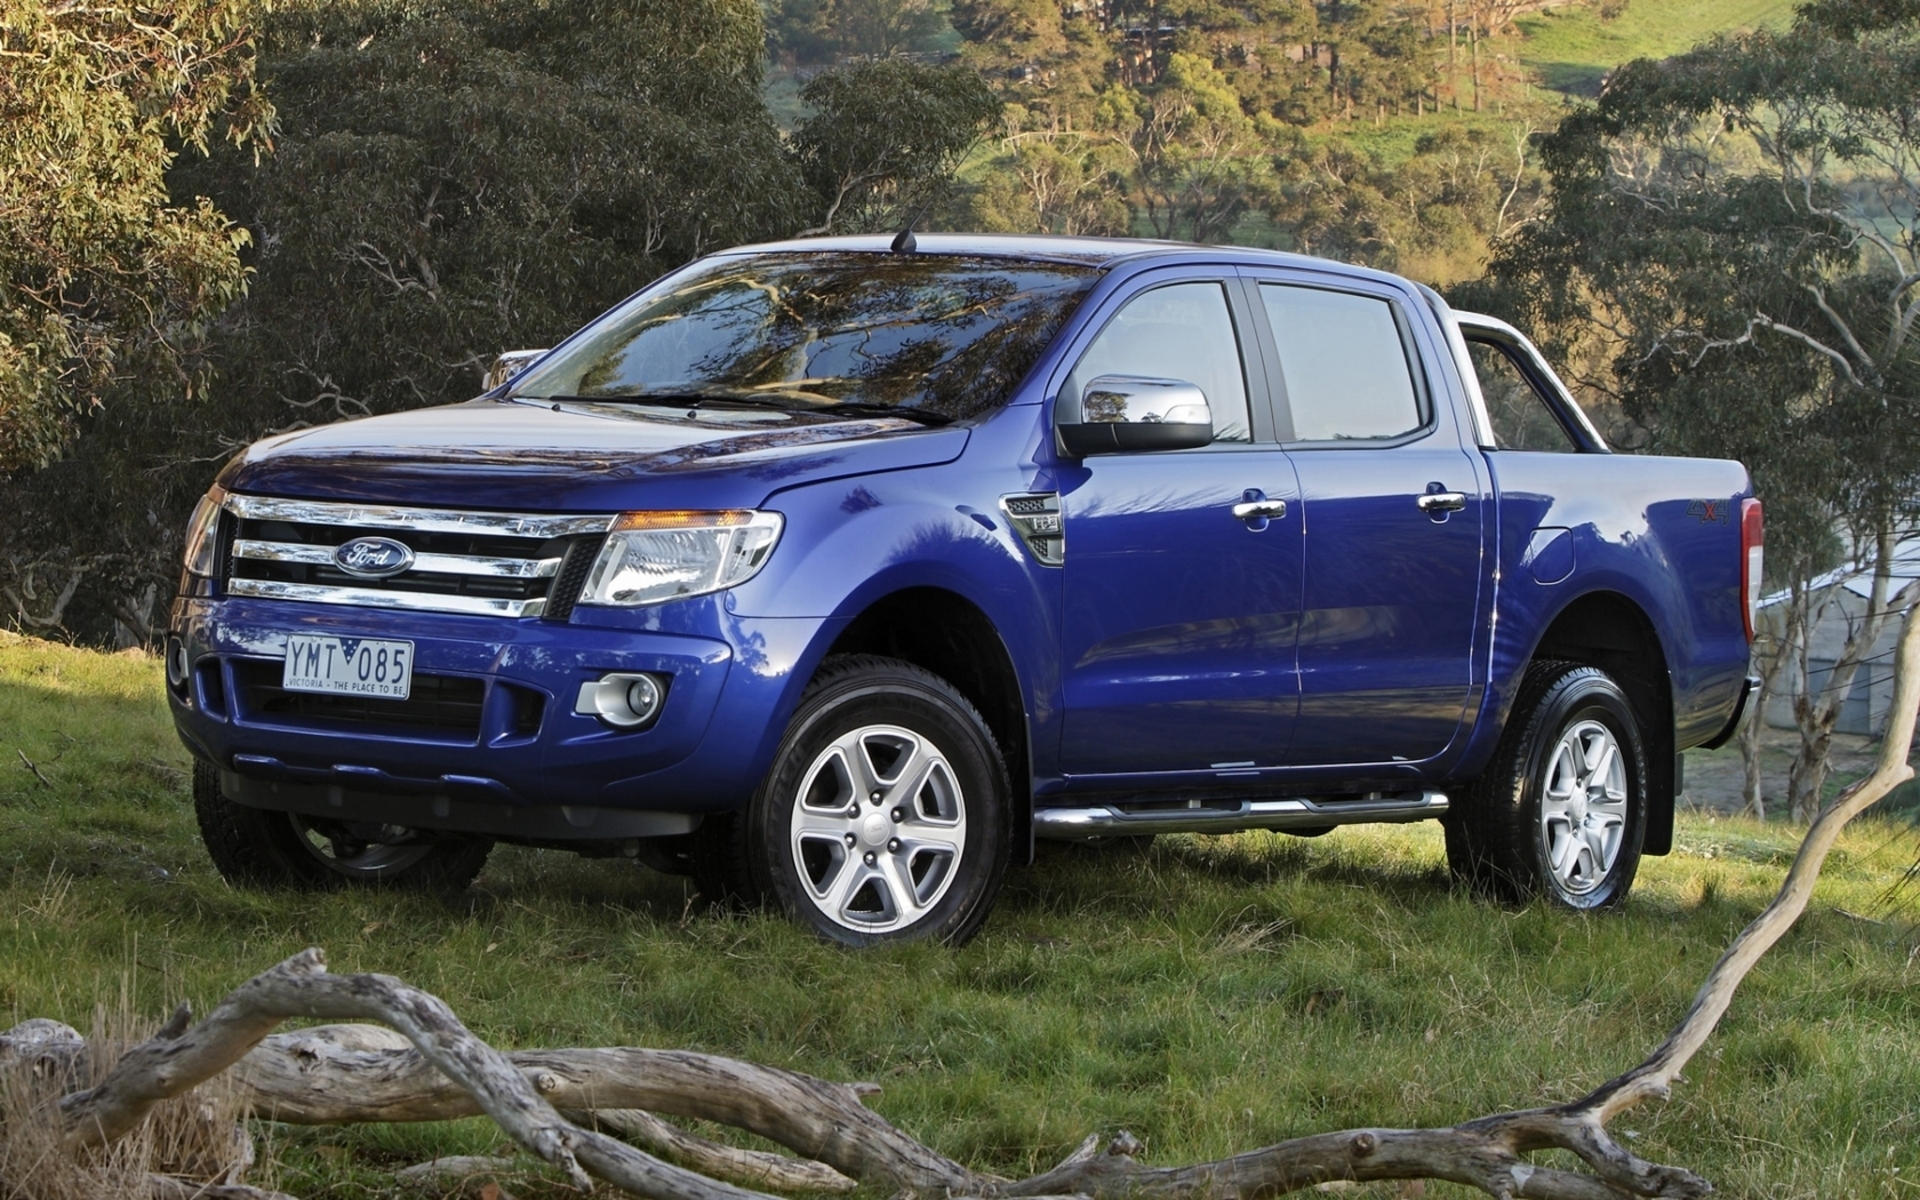 Ford Ranger Full Hd Fond D 233 Cran And Arri 232 Re Plan